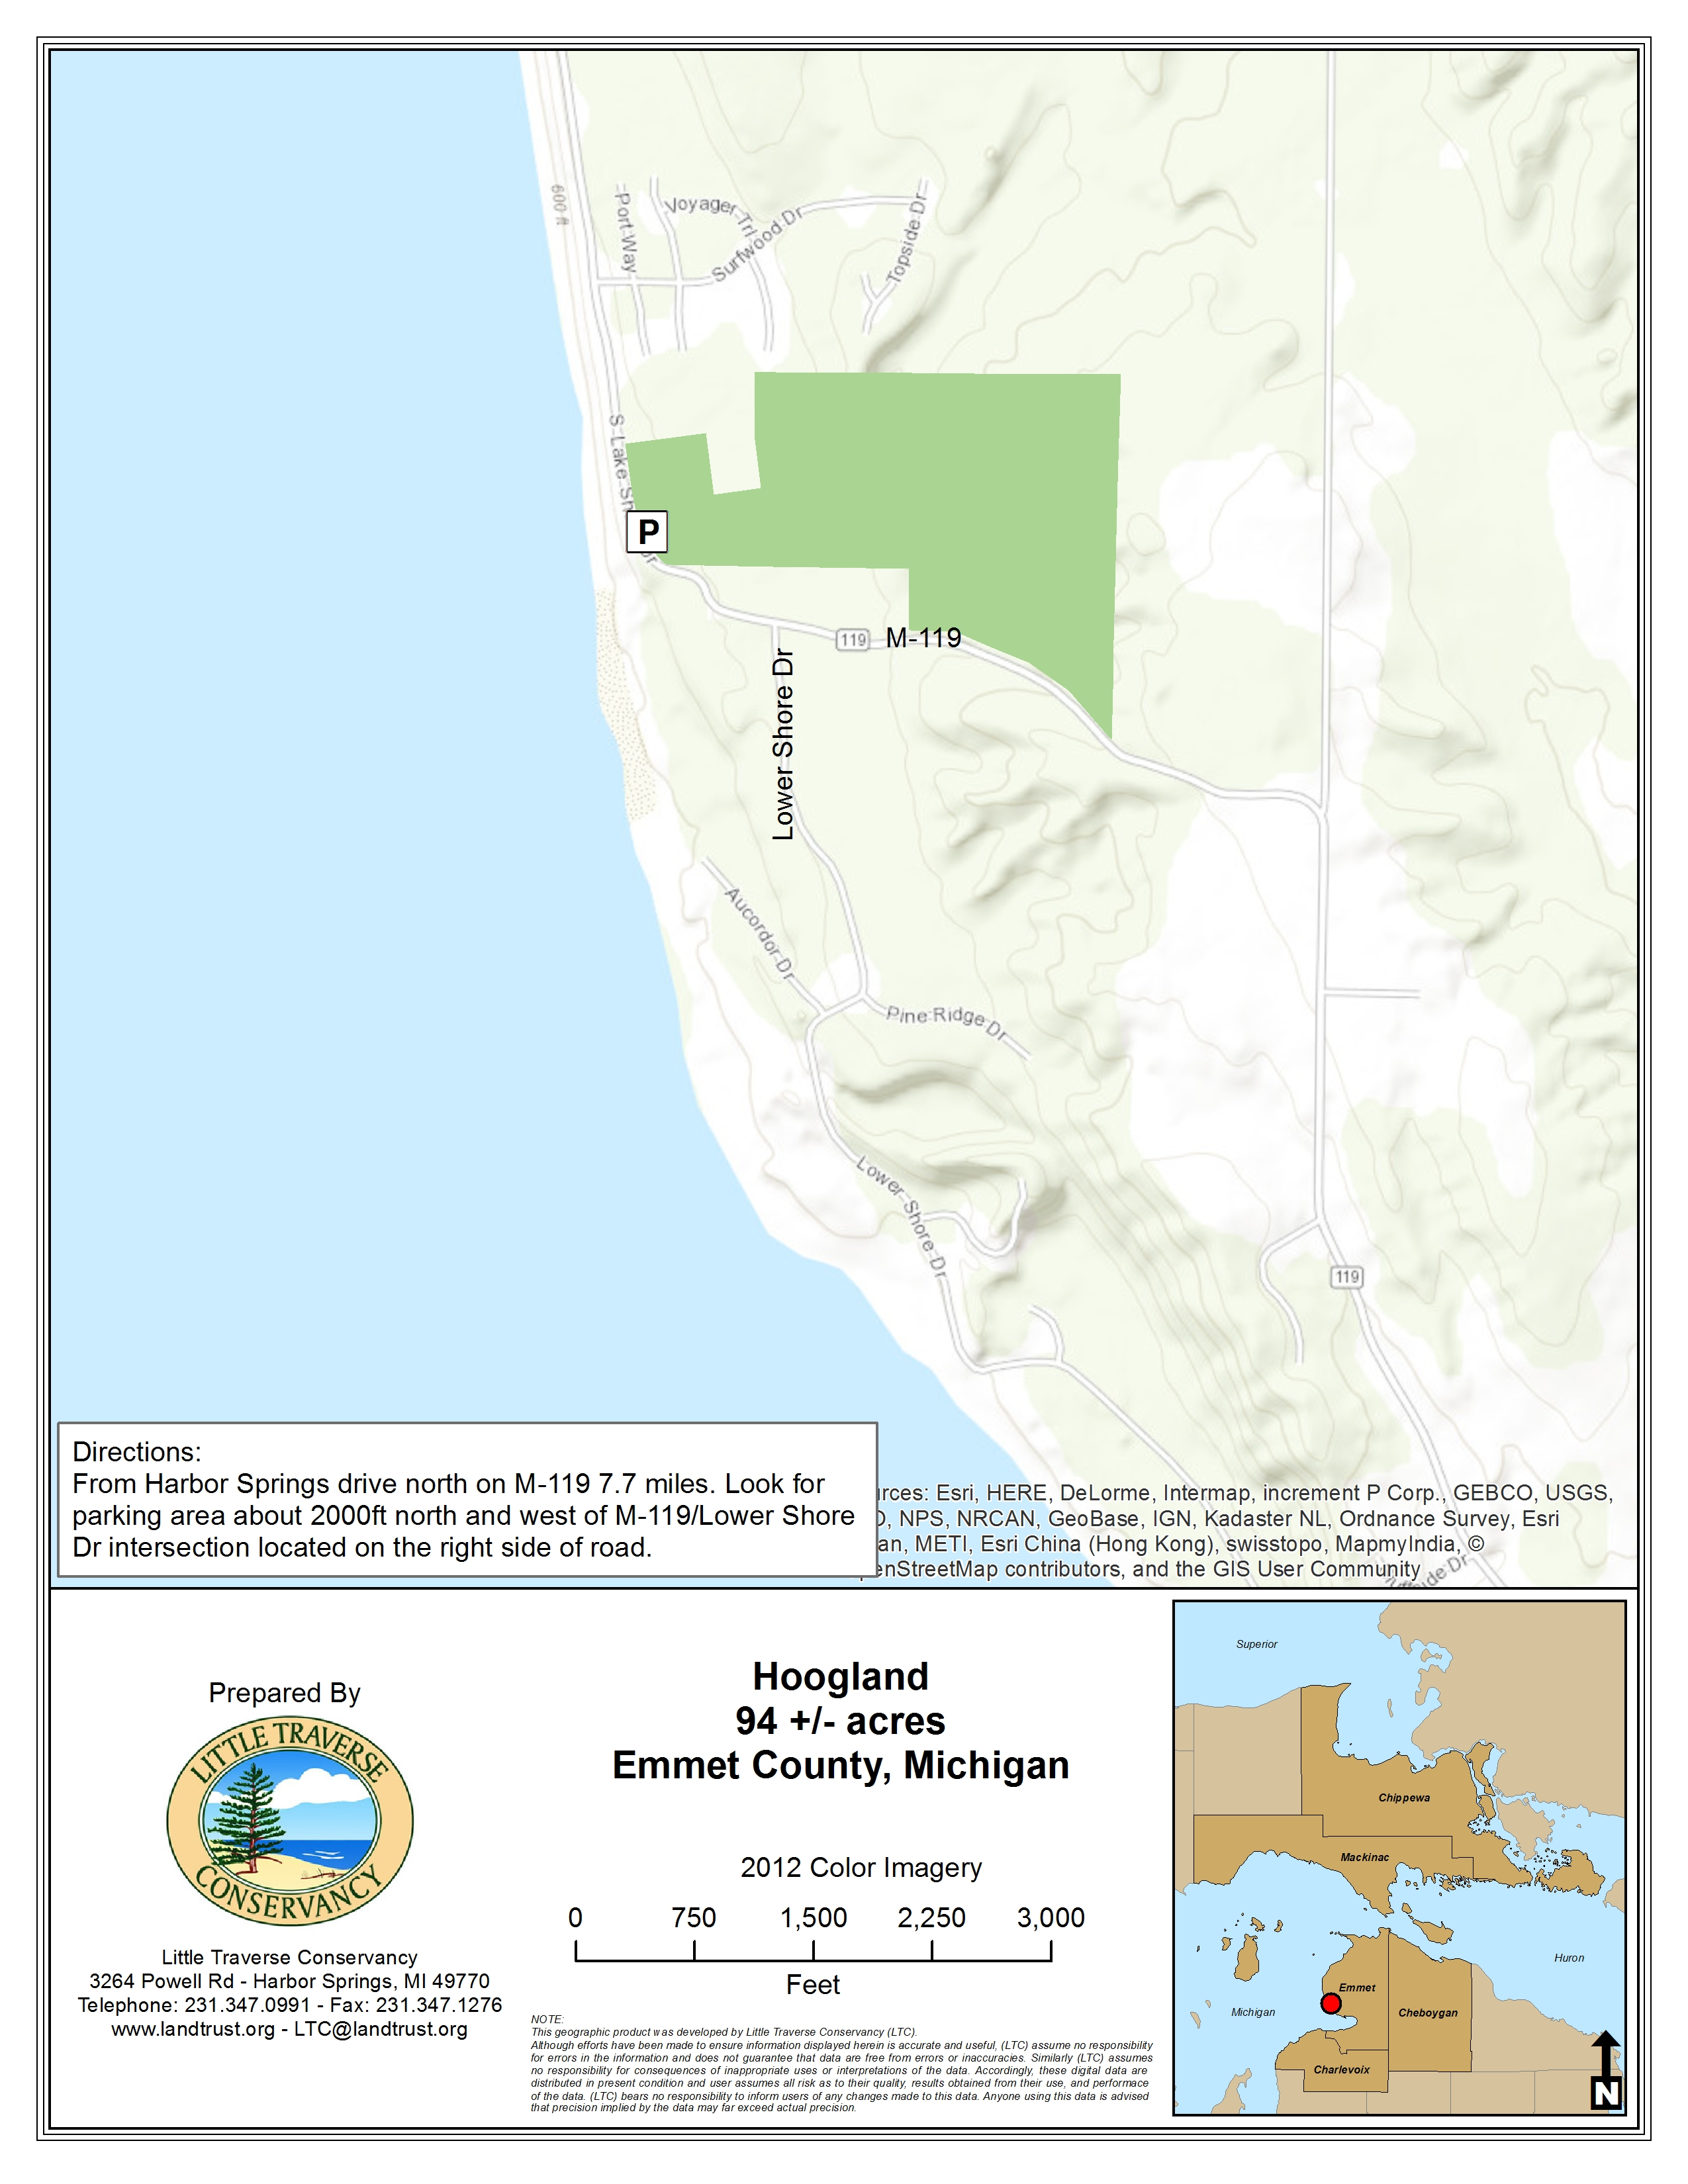 Michigan emmet county alanson - Hoogland Family